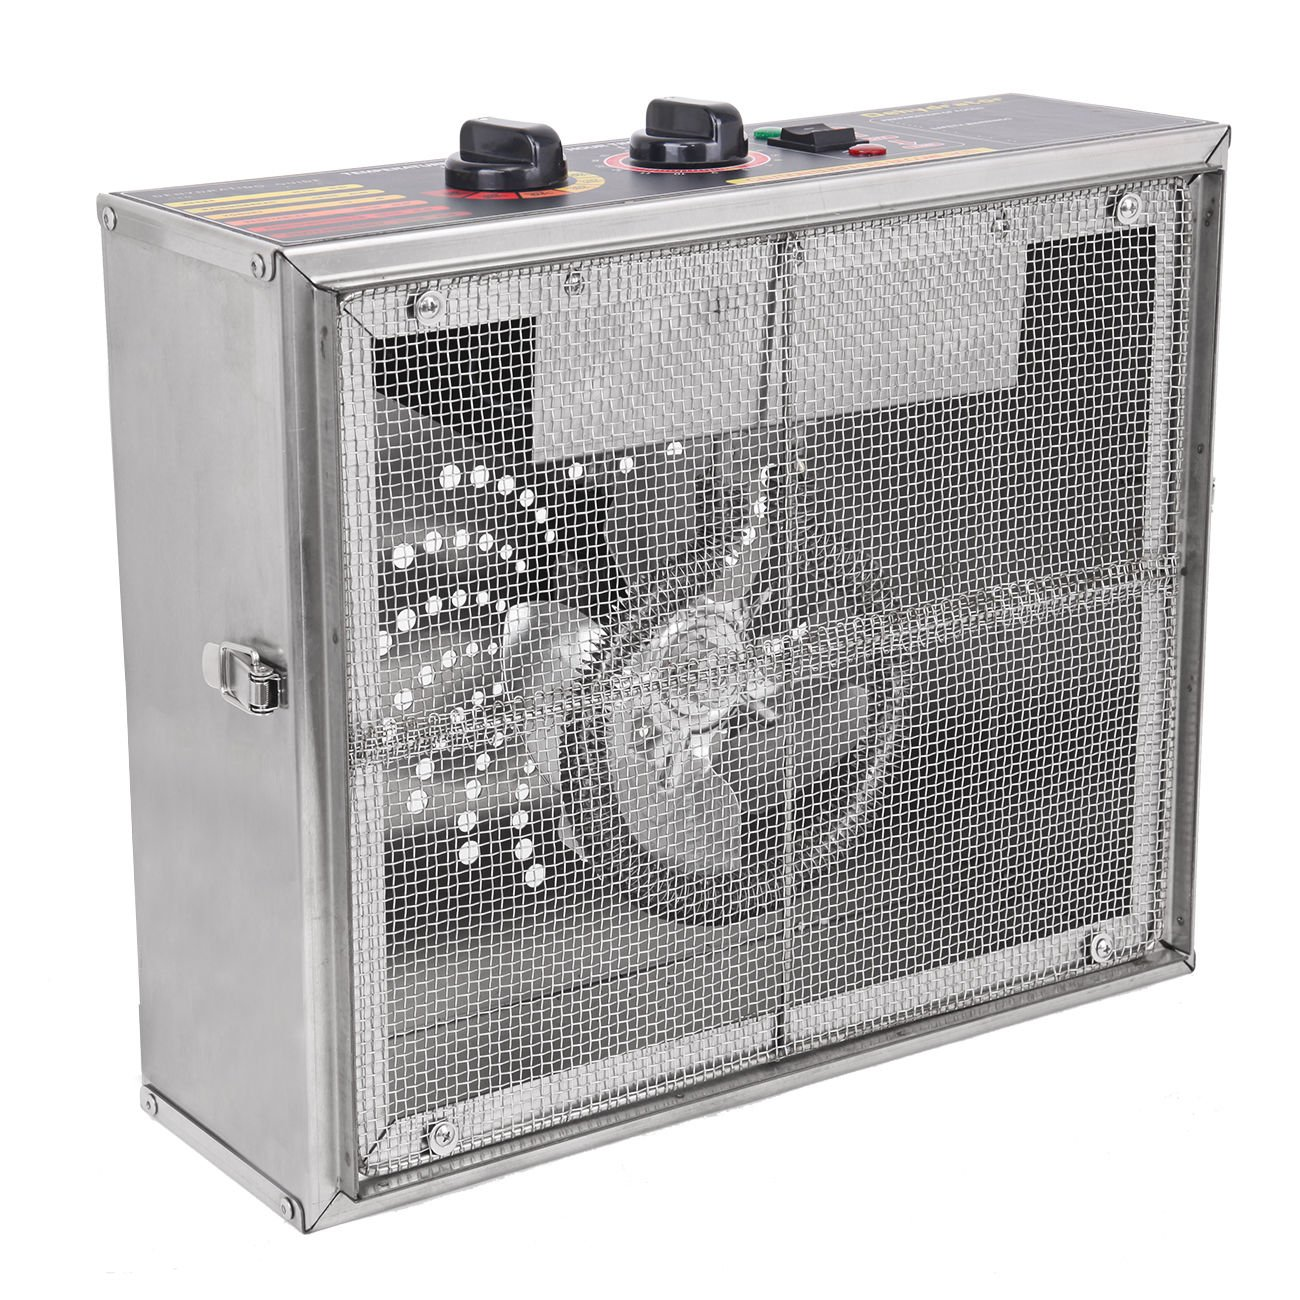 Ridgeyard 1000W Dehydrator Commercial Grade Stainless Steel Digital Food Dehydrator Jerky Dryer 10 Trays 158 Degree Fahrenheit with 15 Hour Timer by Ridgeyard (Image #6)